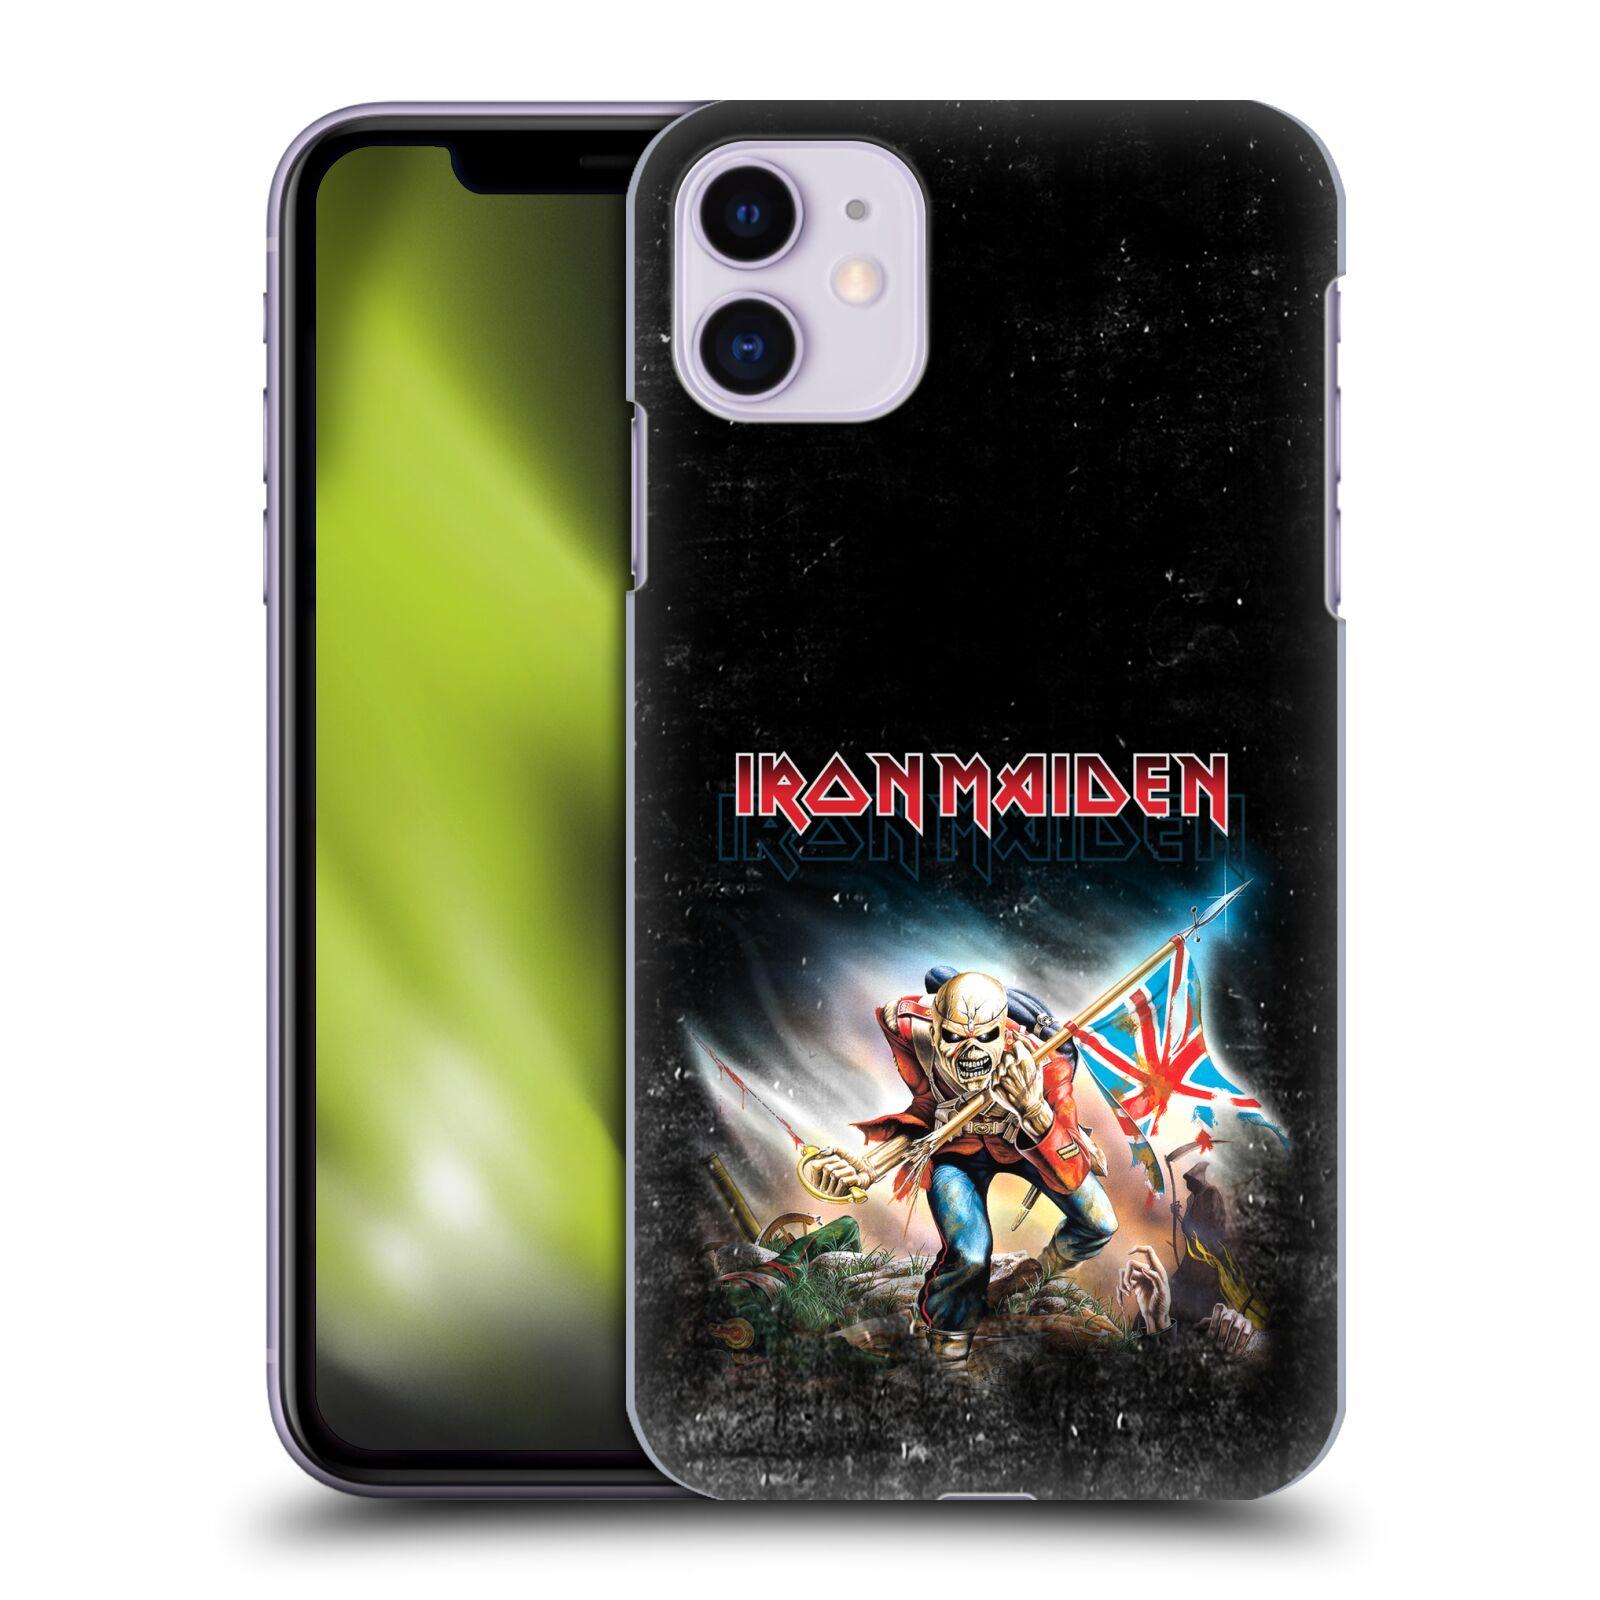 Plastové pouzdro na mobil Apple iPhone 11 - Head Case - Iron Maiden - Trooper 2016